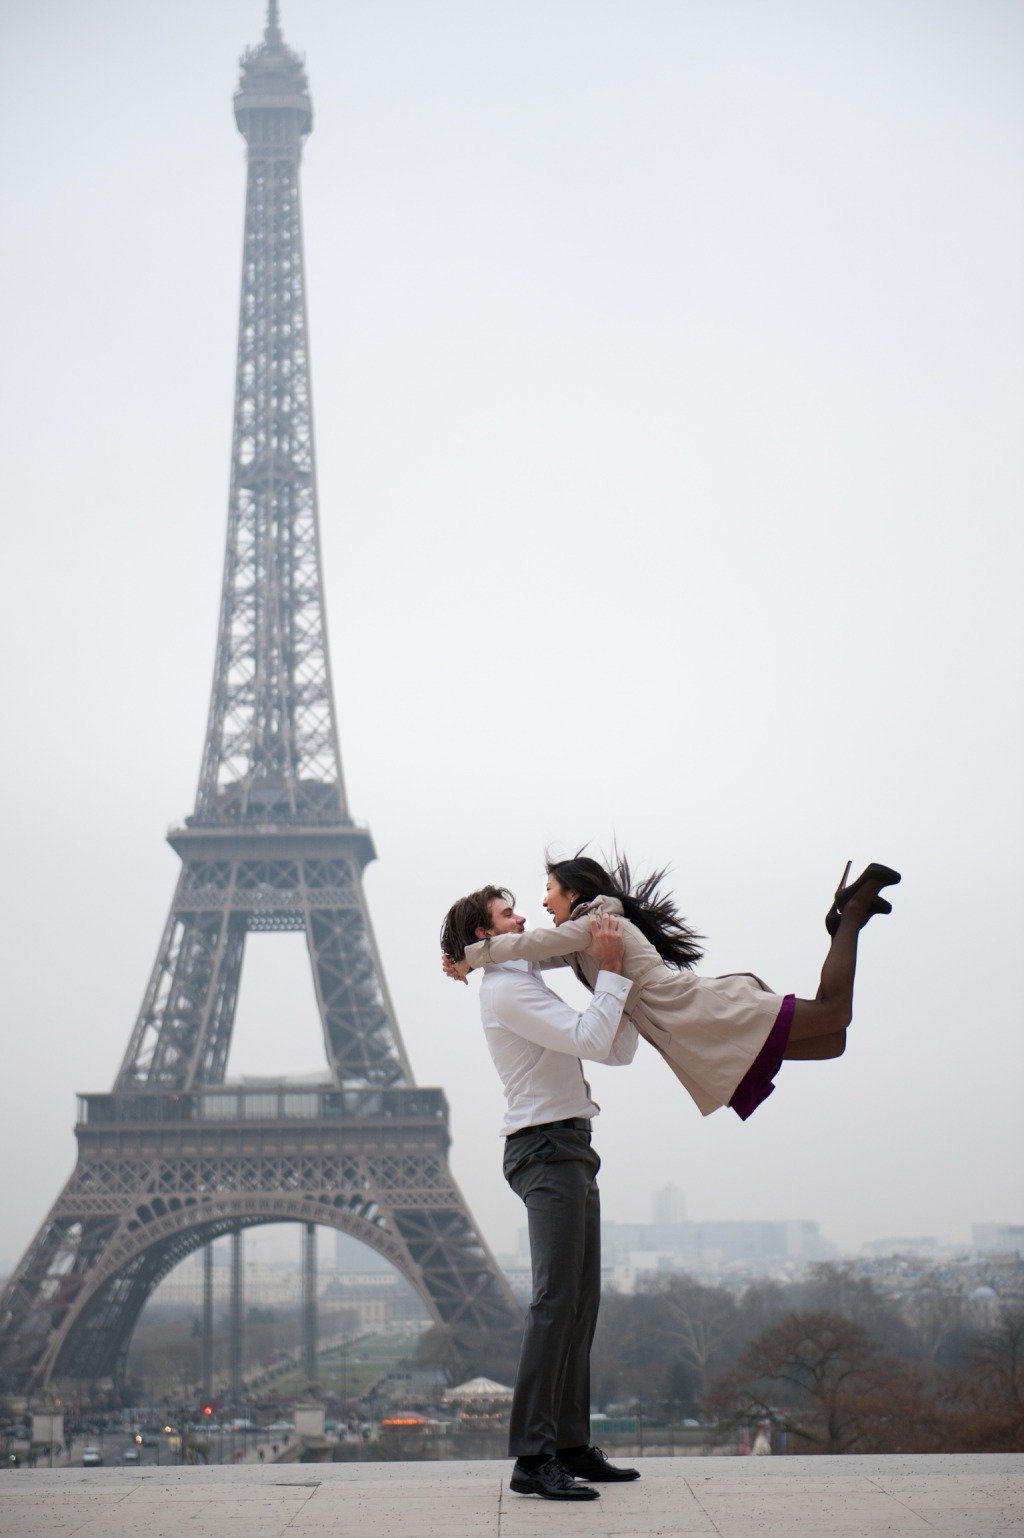 paris_photographer-best-of2-30-1024x1538